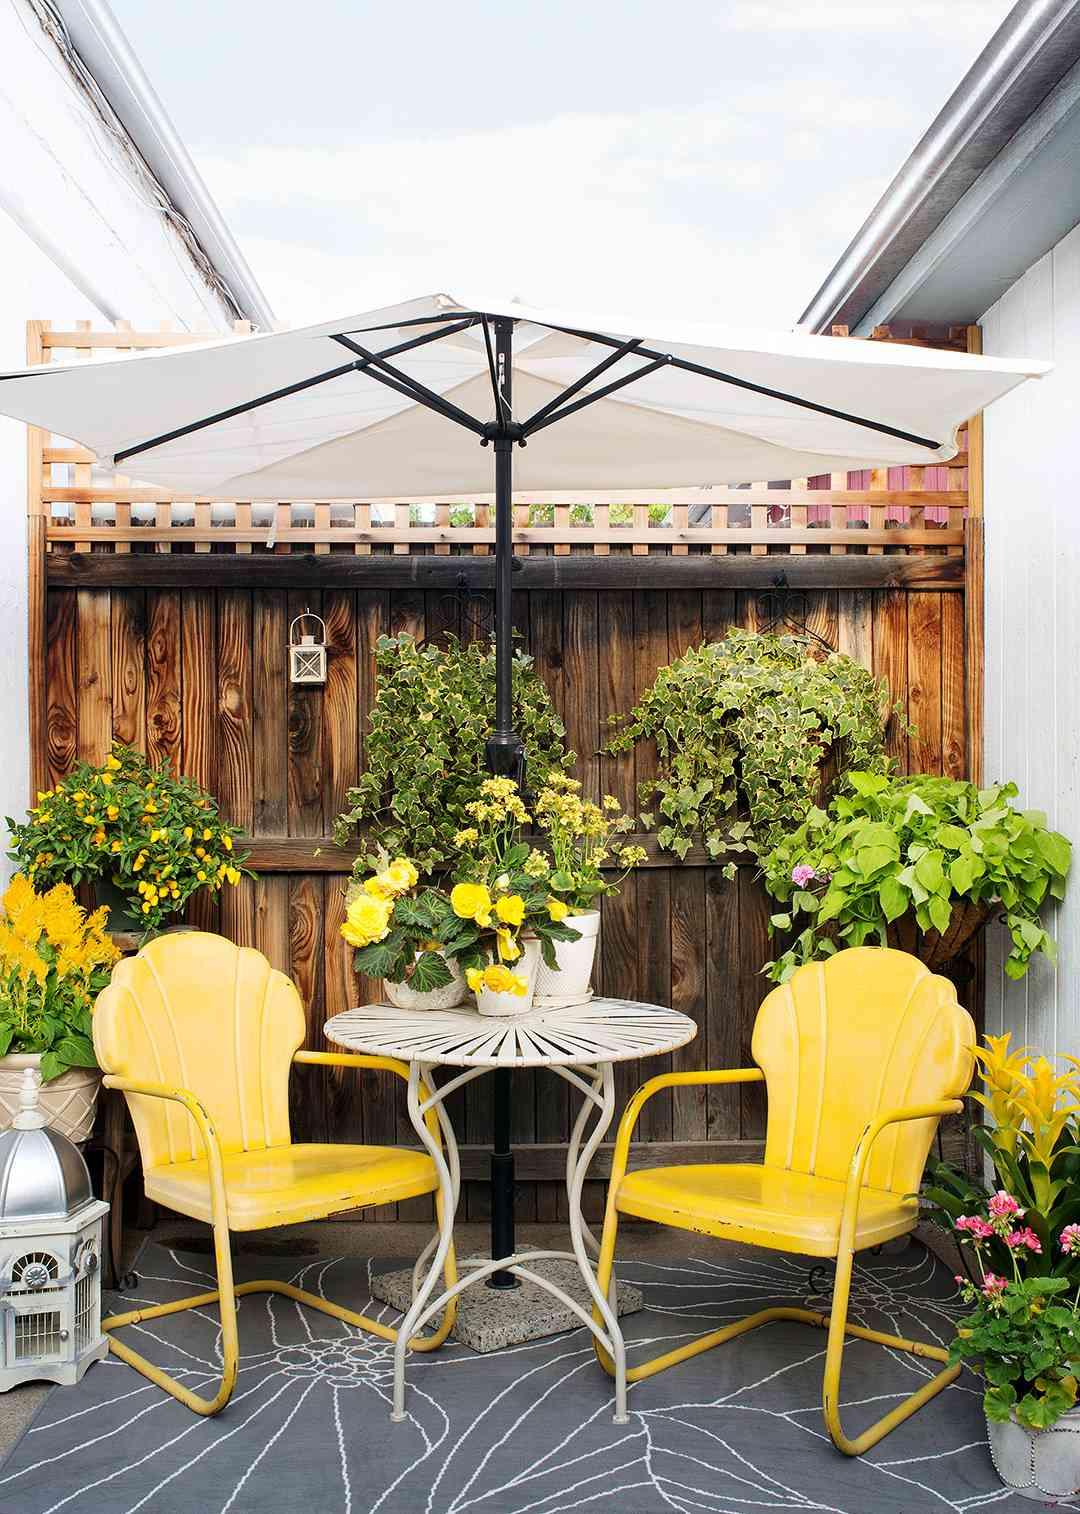 9 Budget-Friendly Backyard Ideas | Better Homes & Gardens on Budget Friendly Patio Ideas  id=51076